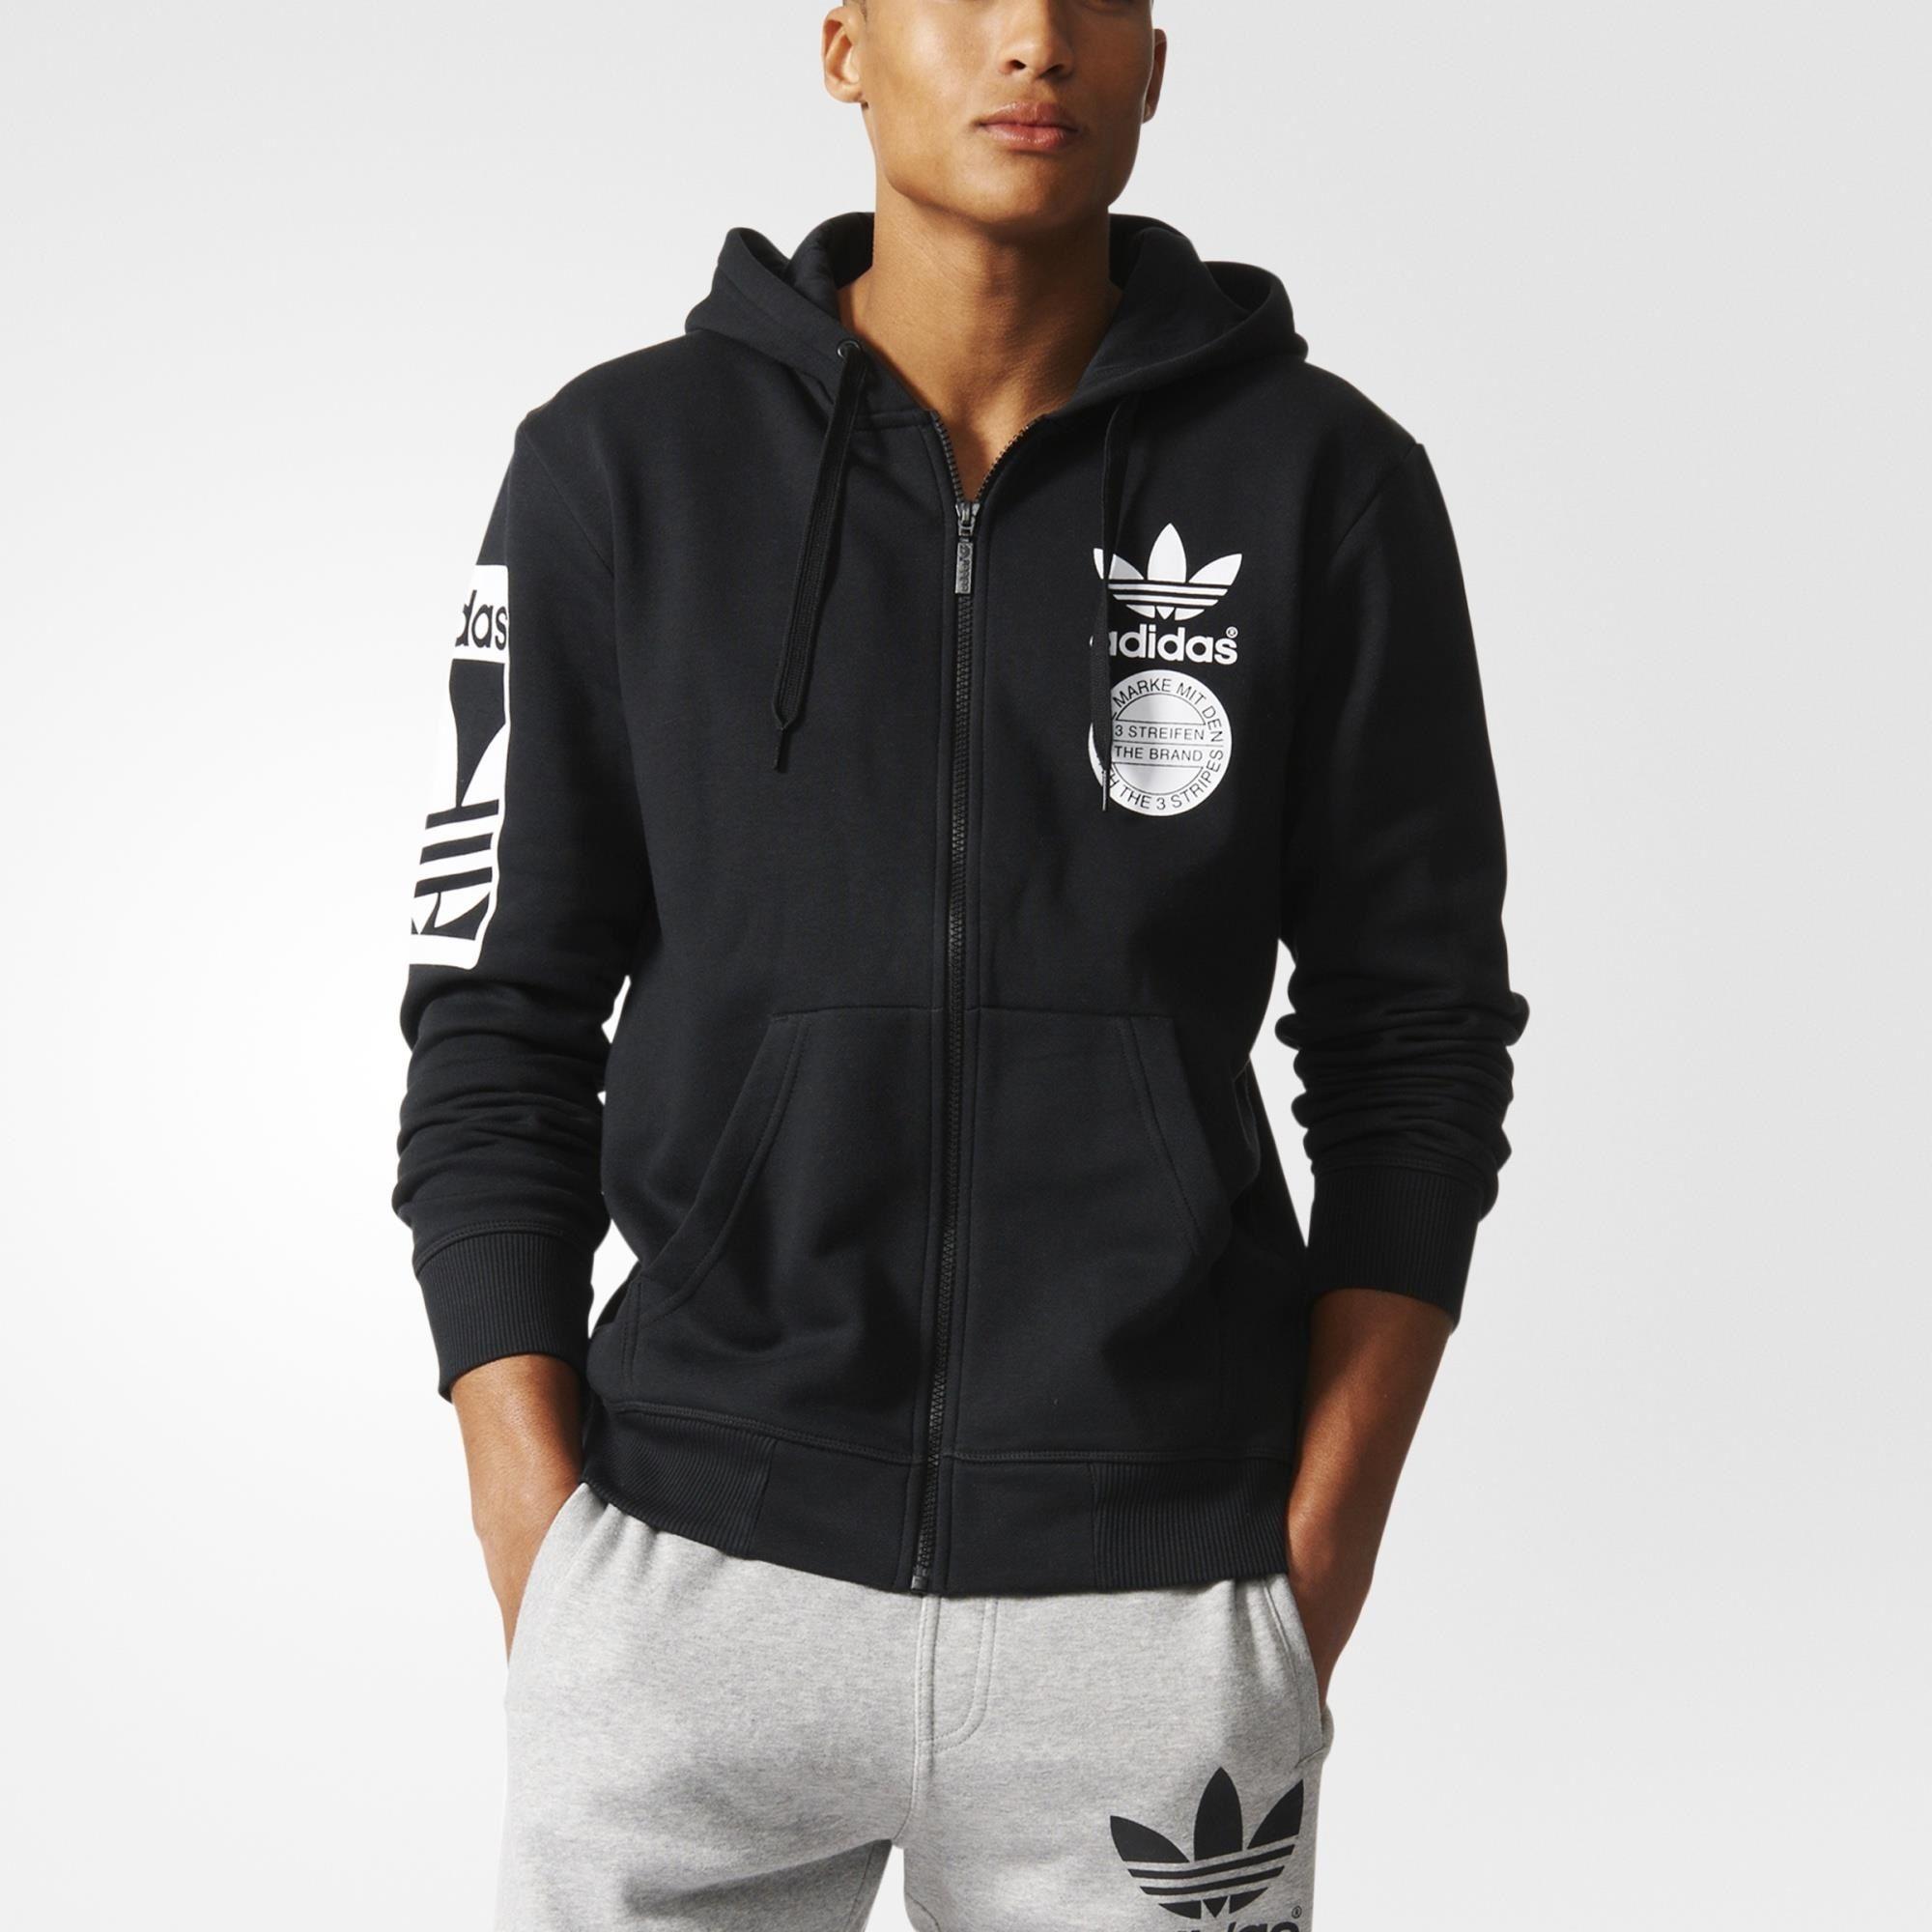 adidas 3 Streifen Core 14 Zip Sweatshirt Grau | adidas